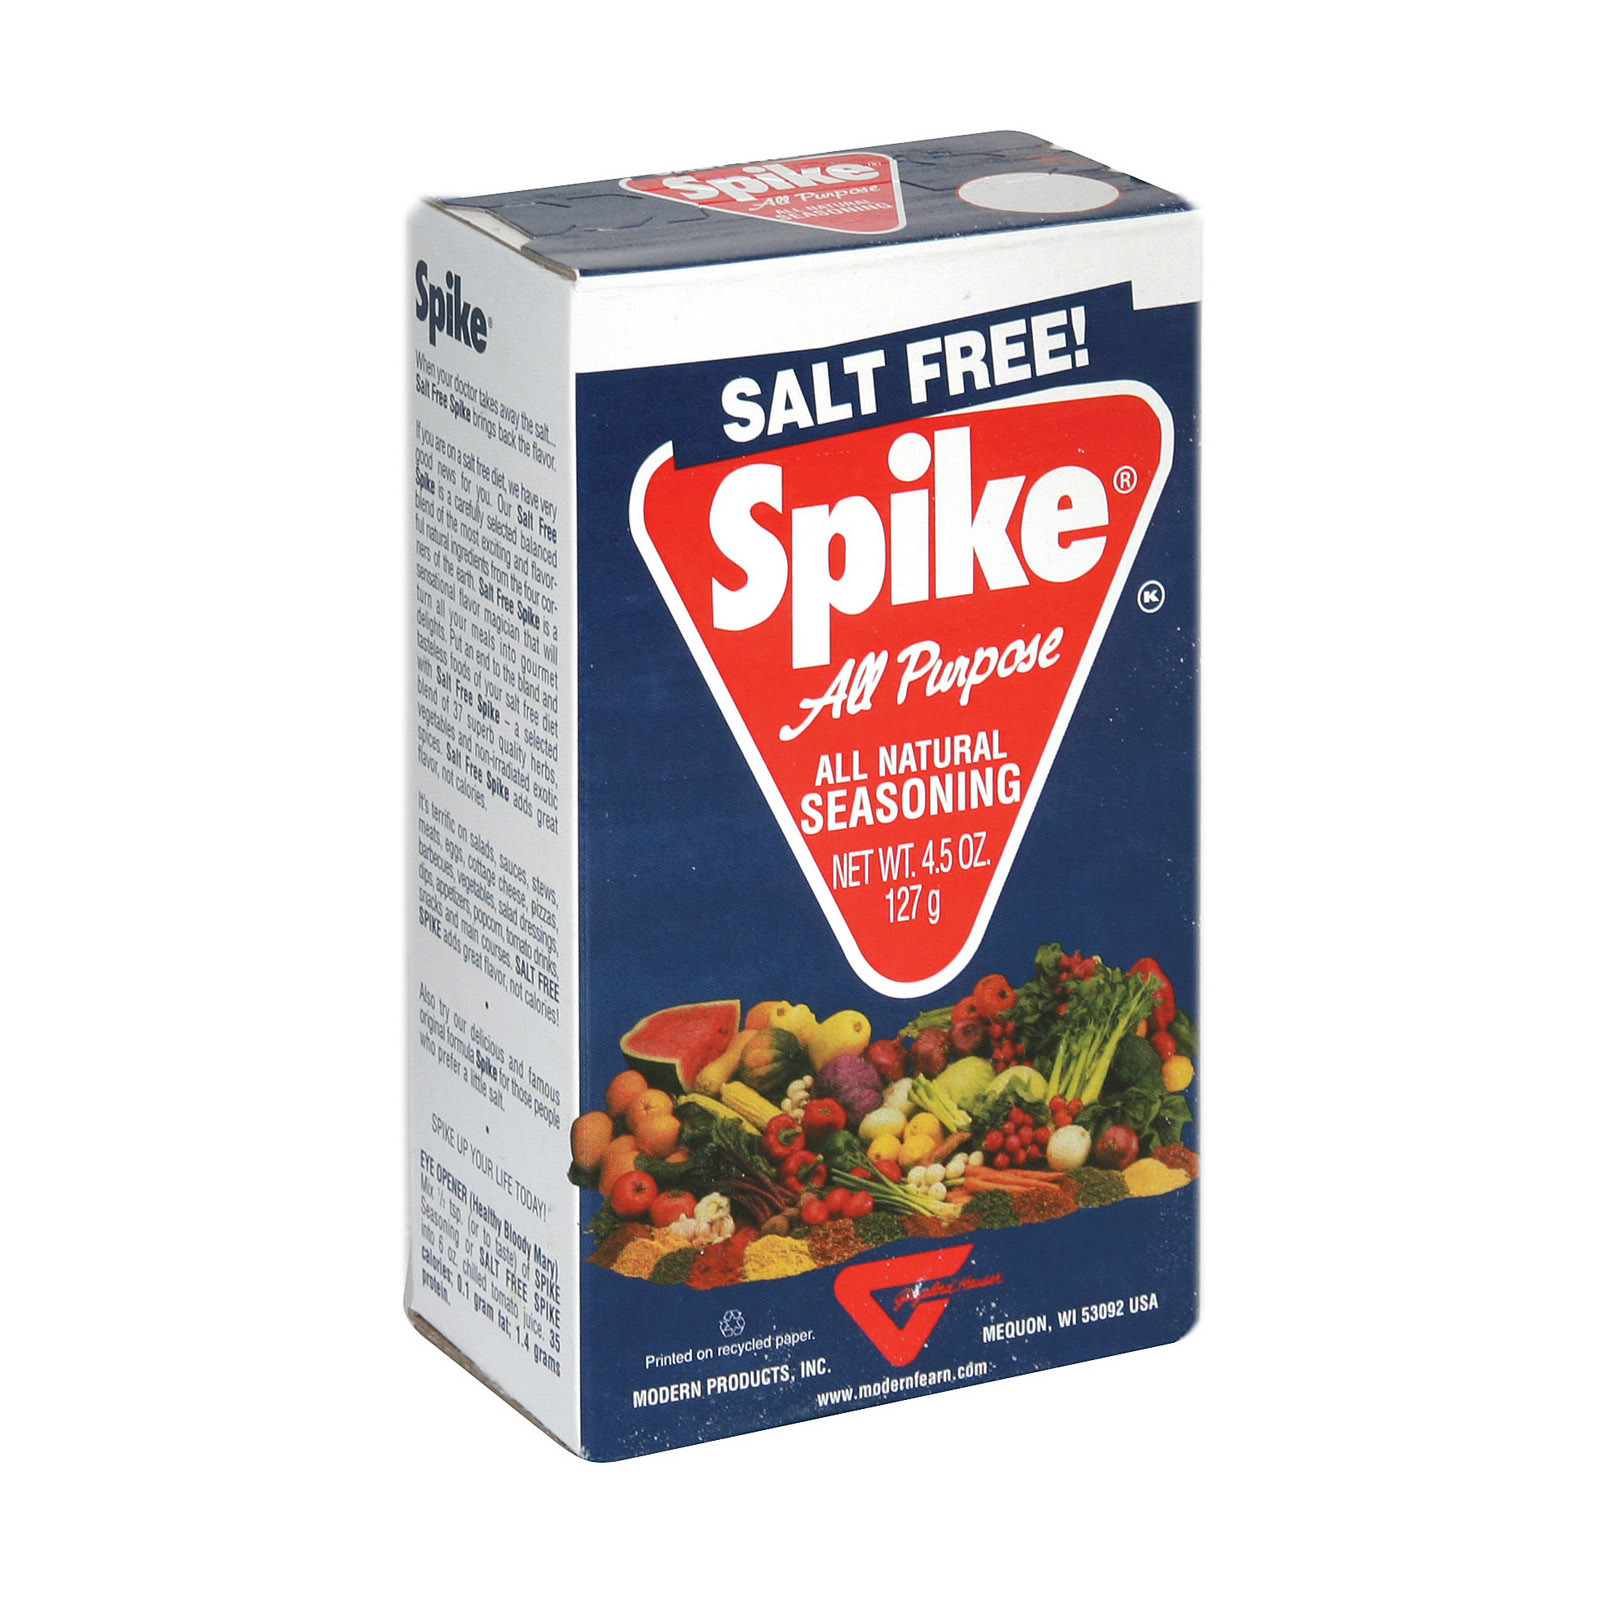 Modern Products Gourmet Spike Seasoning - Salt Free - Case of 12 - 4.5 oz.